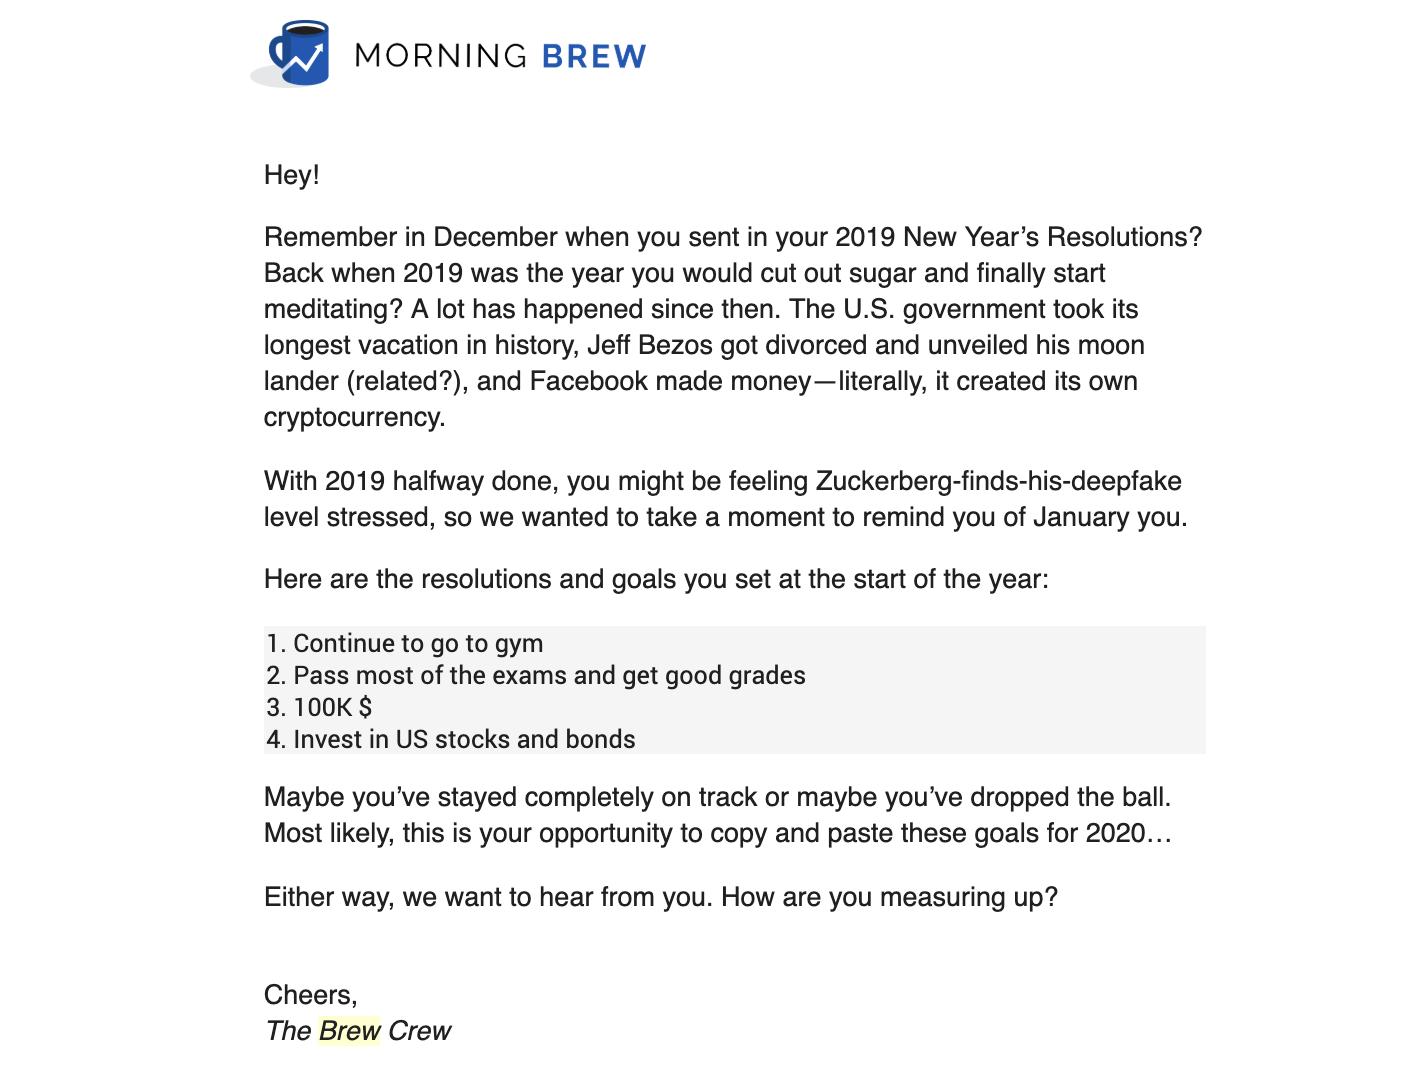 Morning Brew resolutions